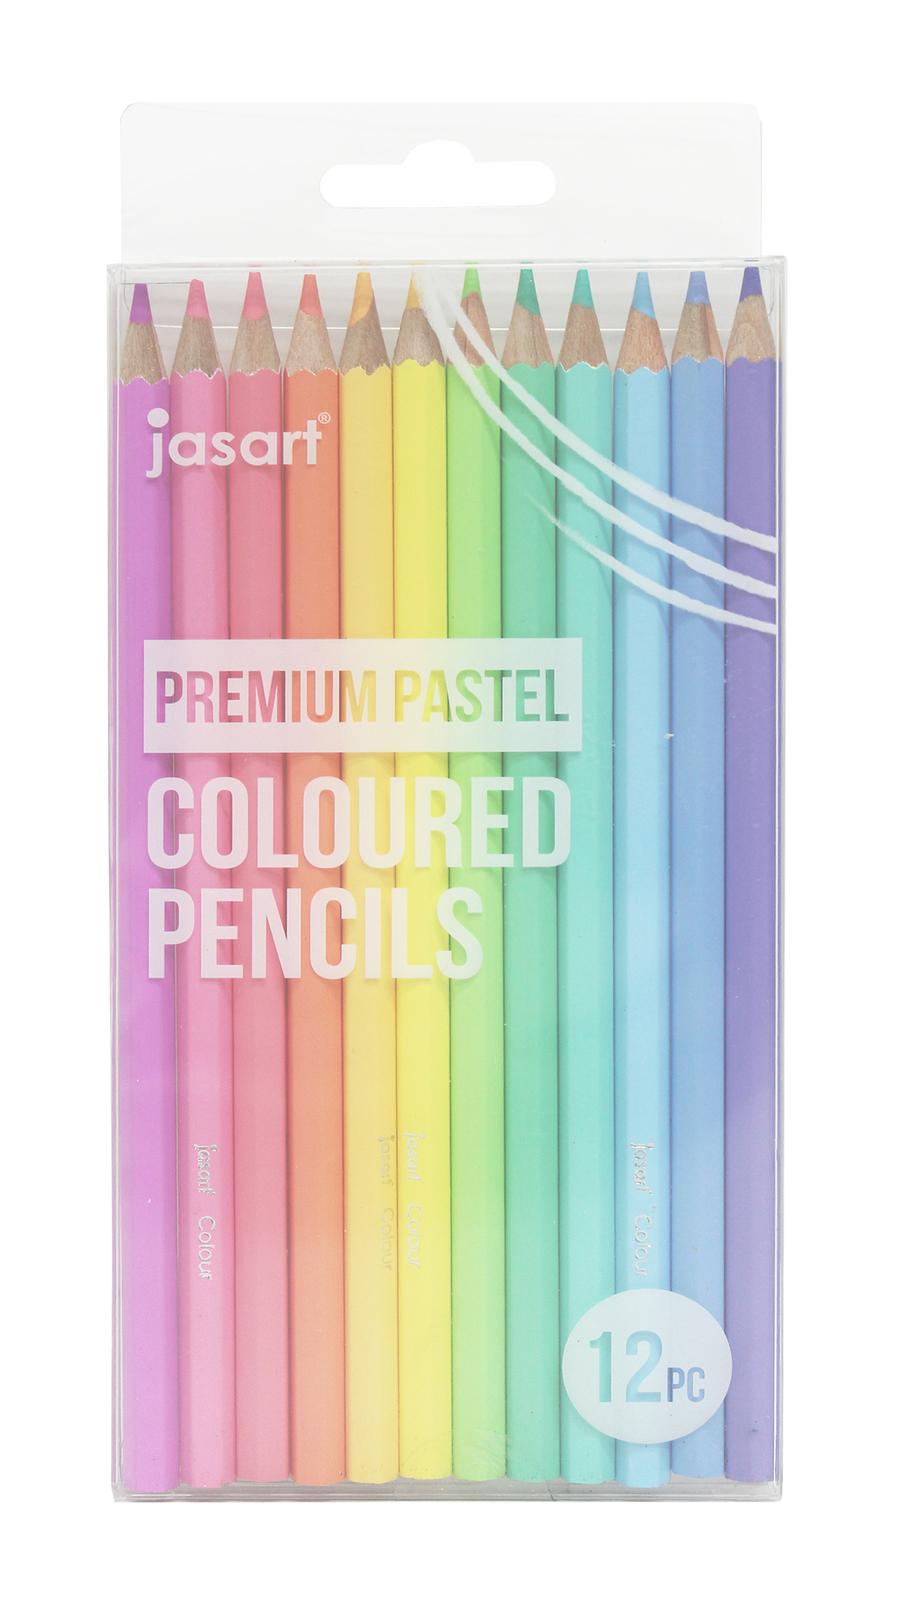 Jasart: Premium Pastel Pencil Set - 12 Pack image